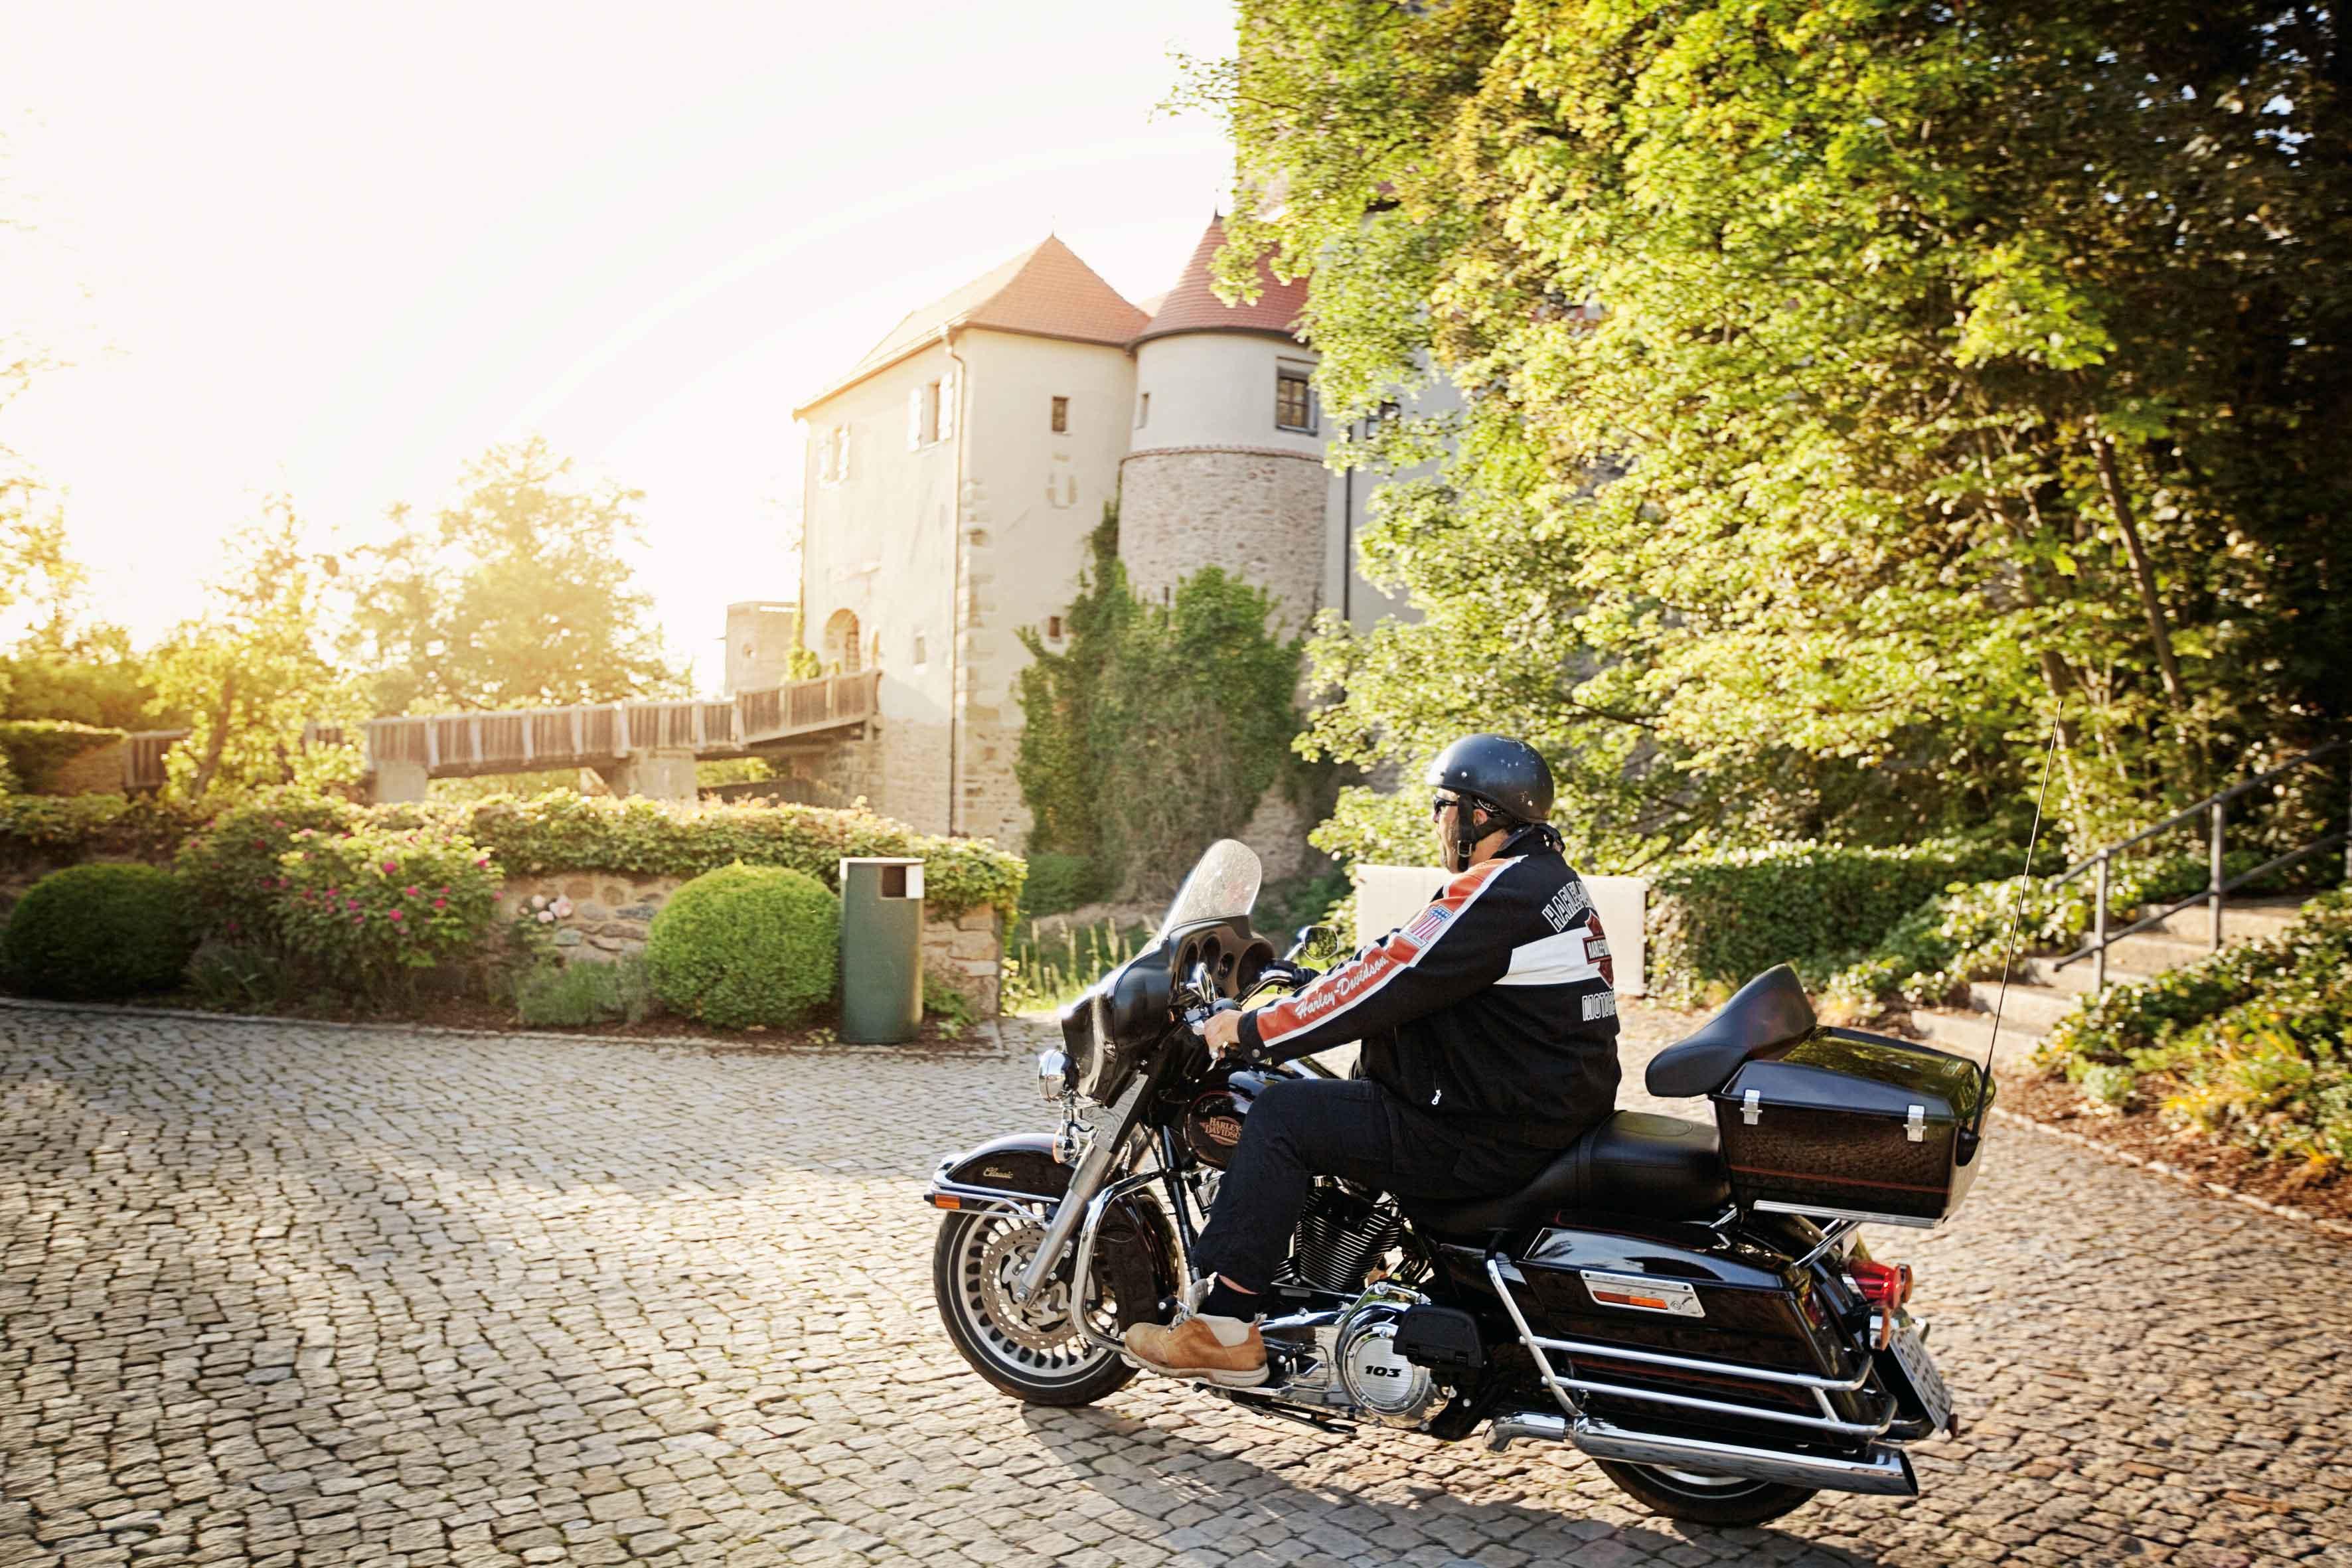 Ankunft Burg Wernberg